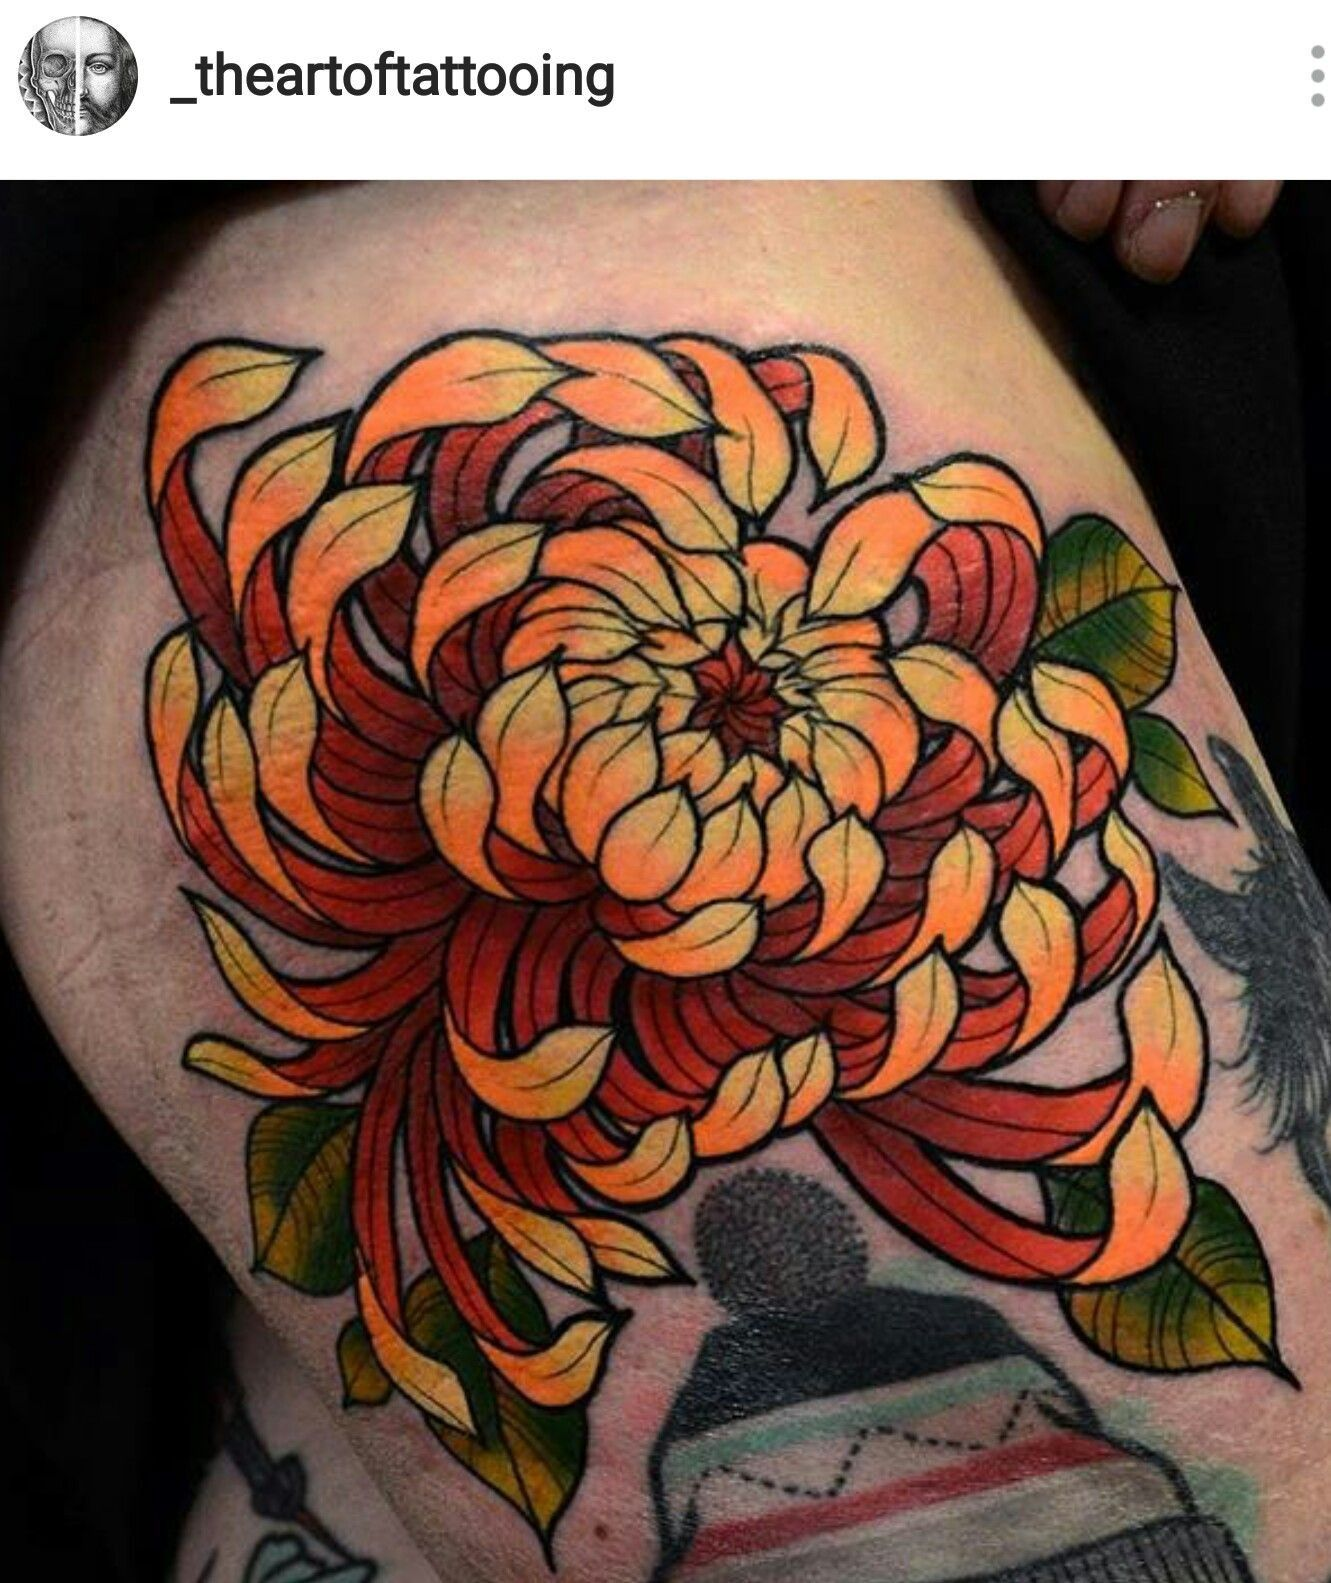 Chrysanthemum Flower Tattoo Design Chrysanthemum Tattoo Japanese Flower Tattoo Tattoos